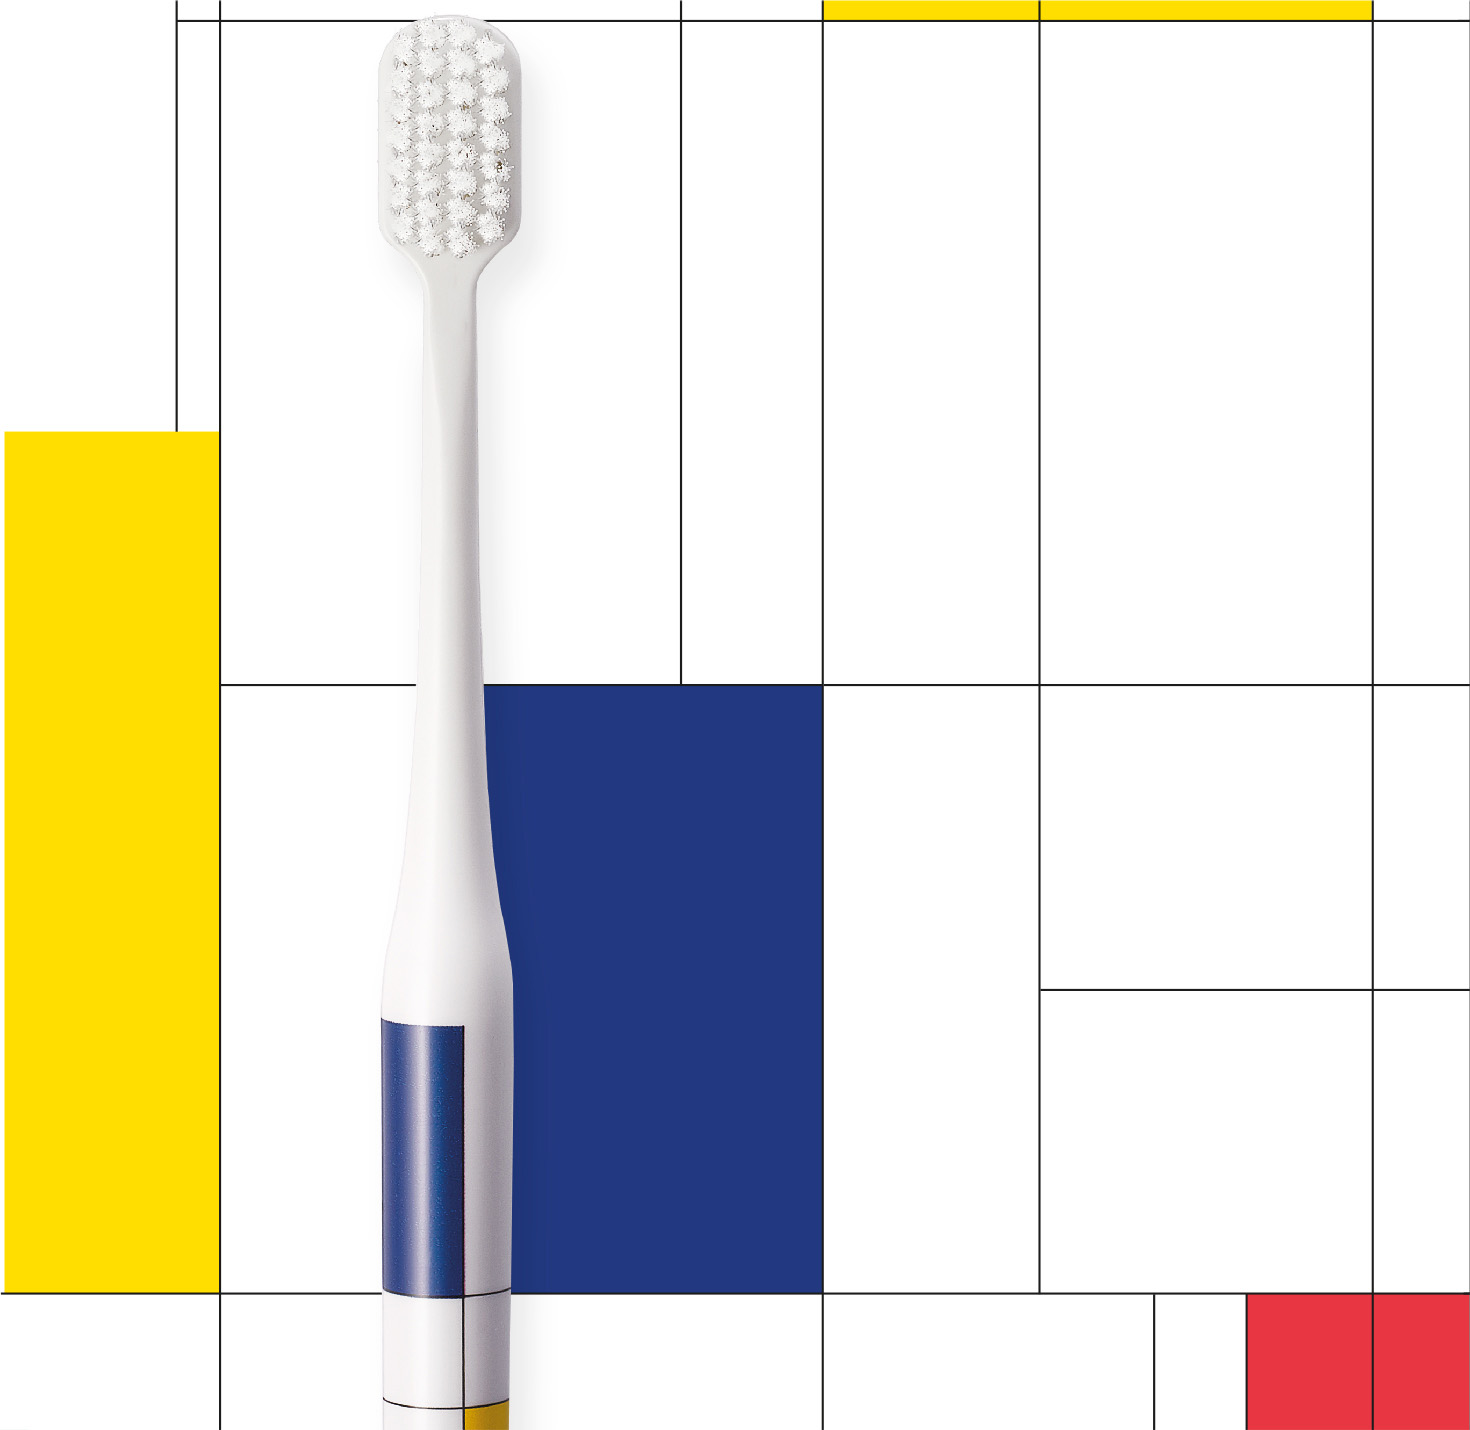 Зубные кисти Abstraction Brush Collection, Montcarotte